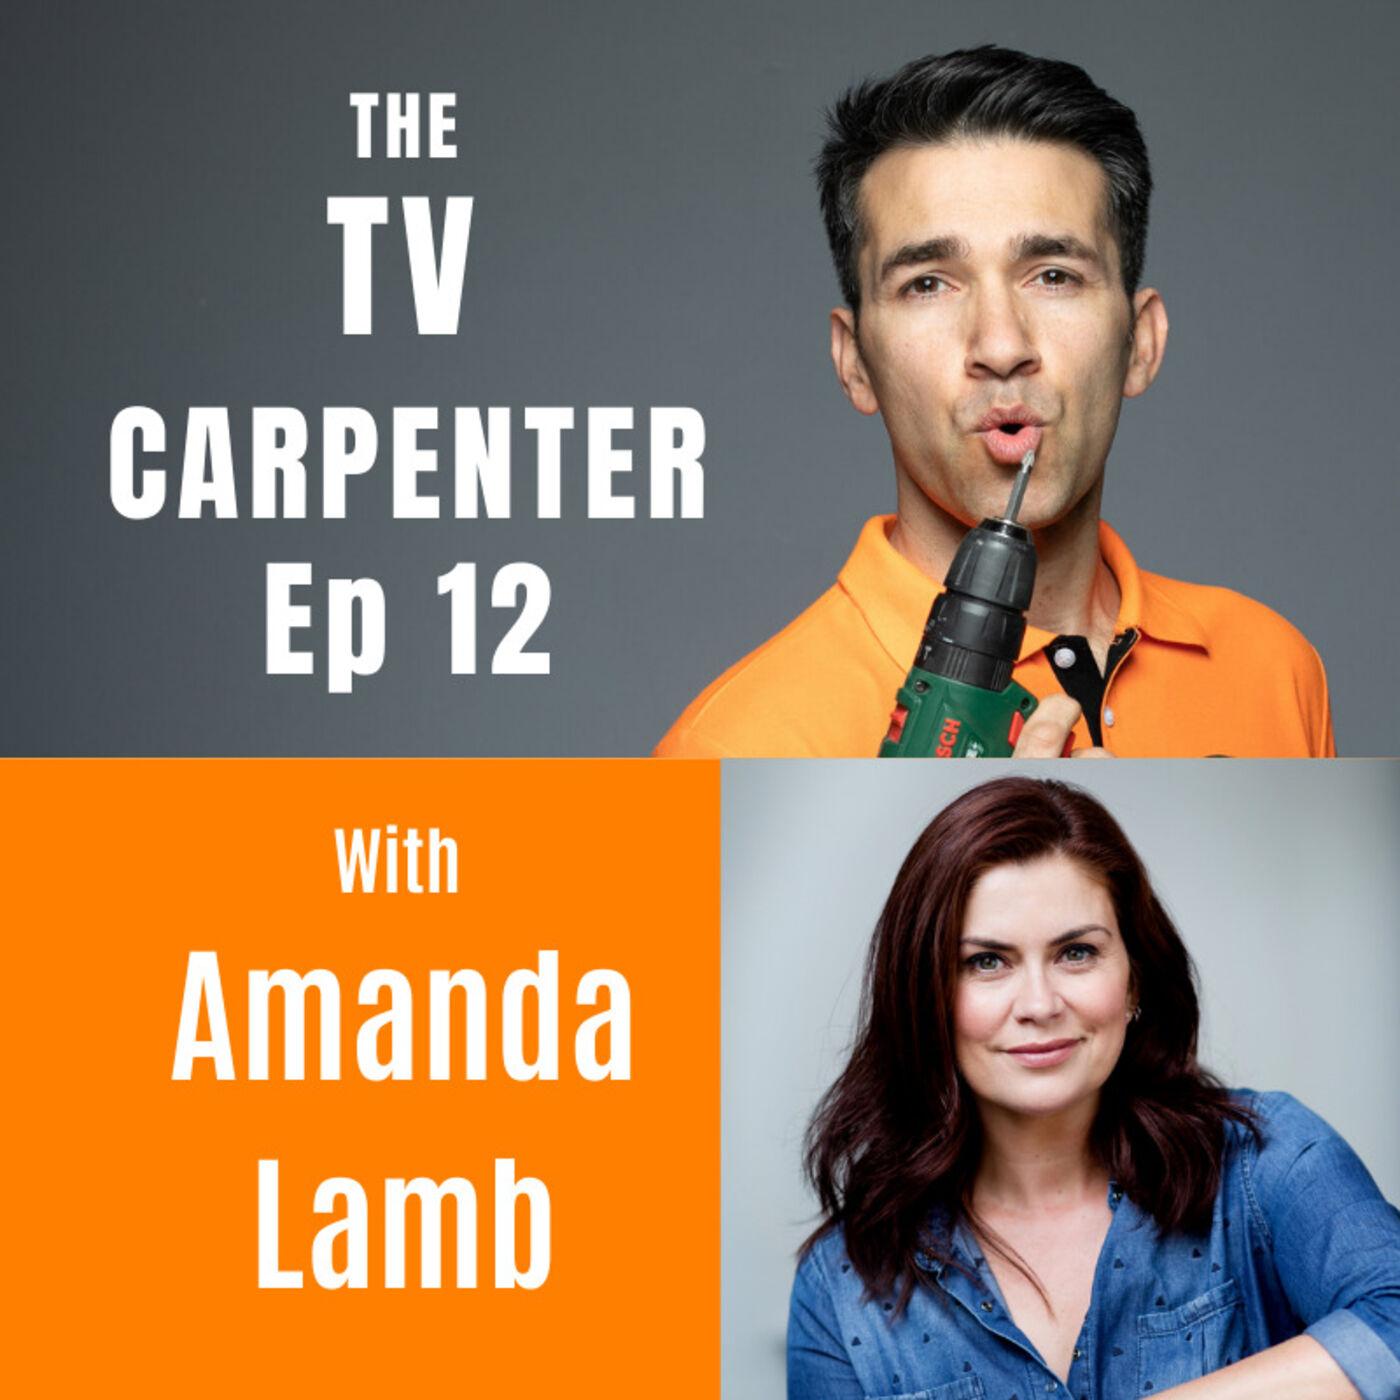 Wayne Chats with Amanda Lamb property expert and TV presenter